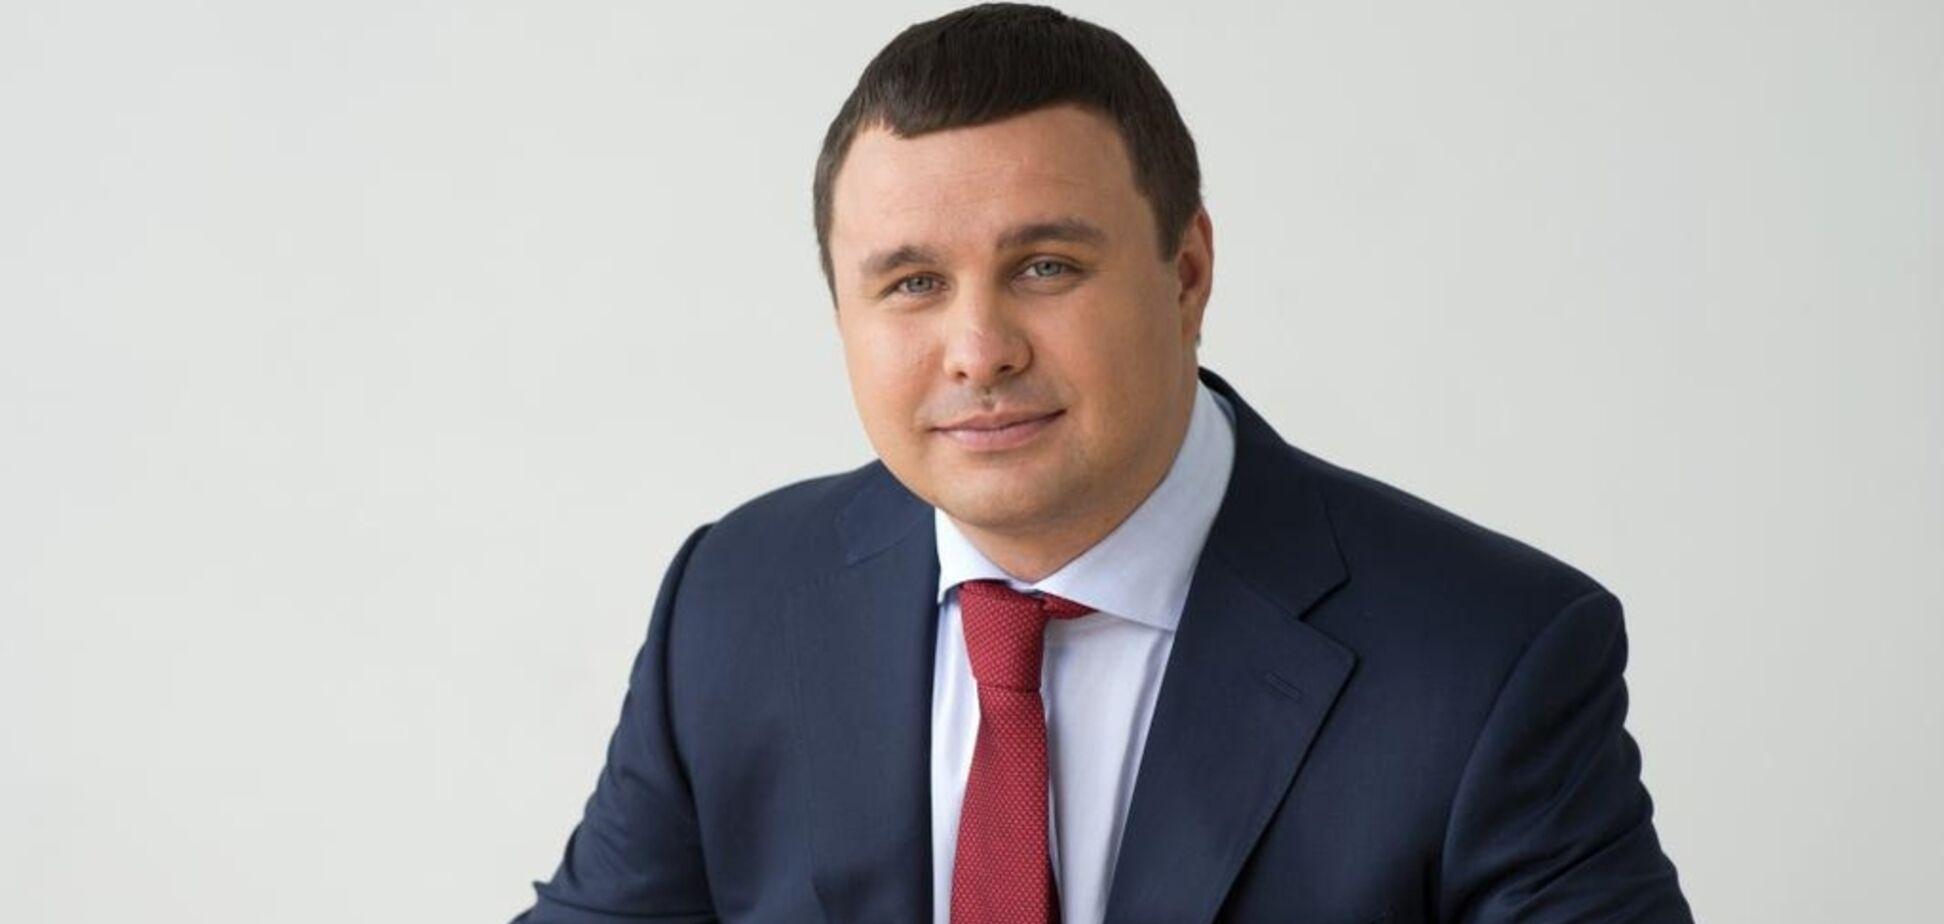 Микитась вышел из СИЗО под залог 80 млн